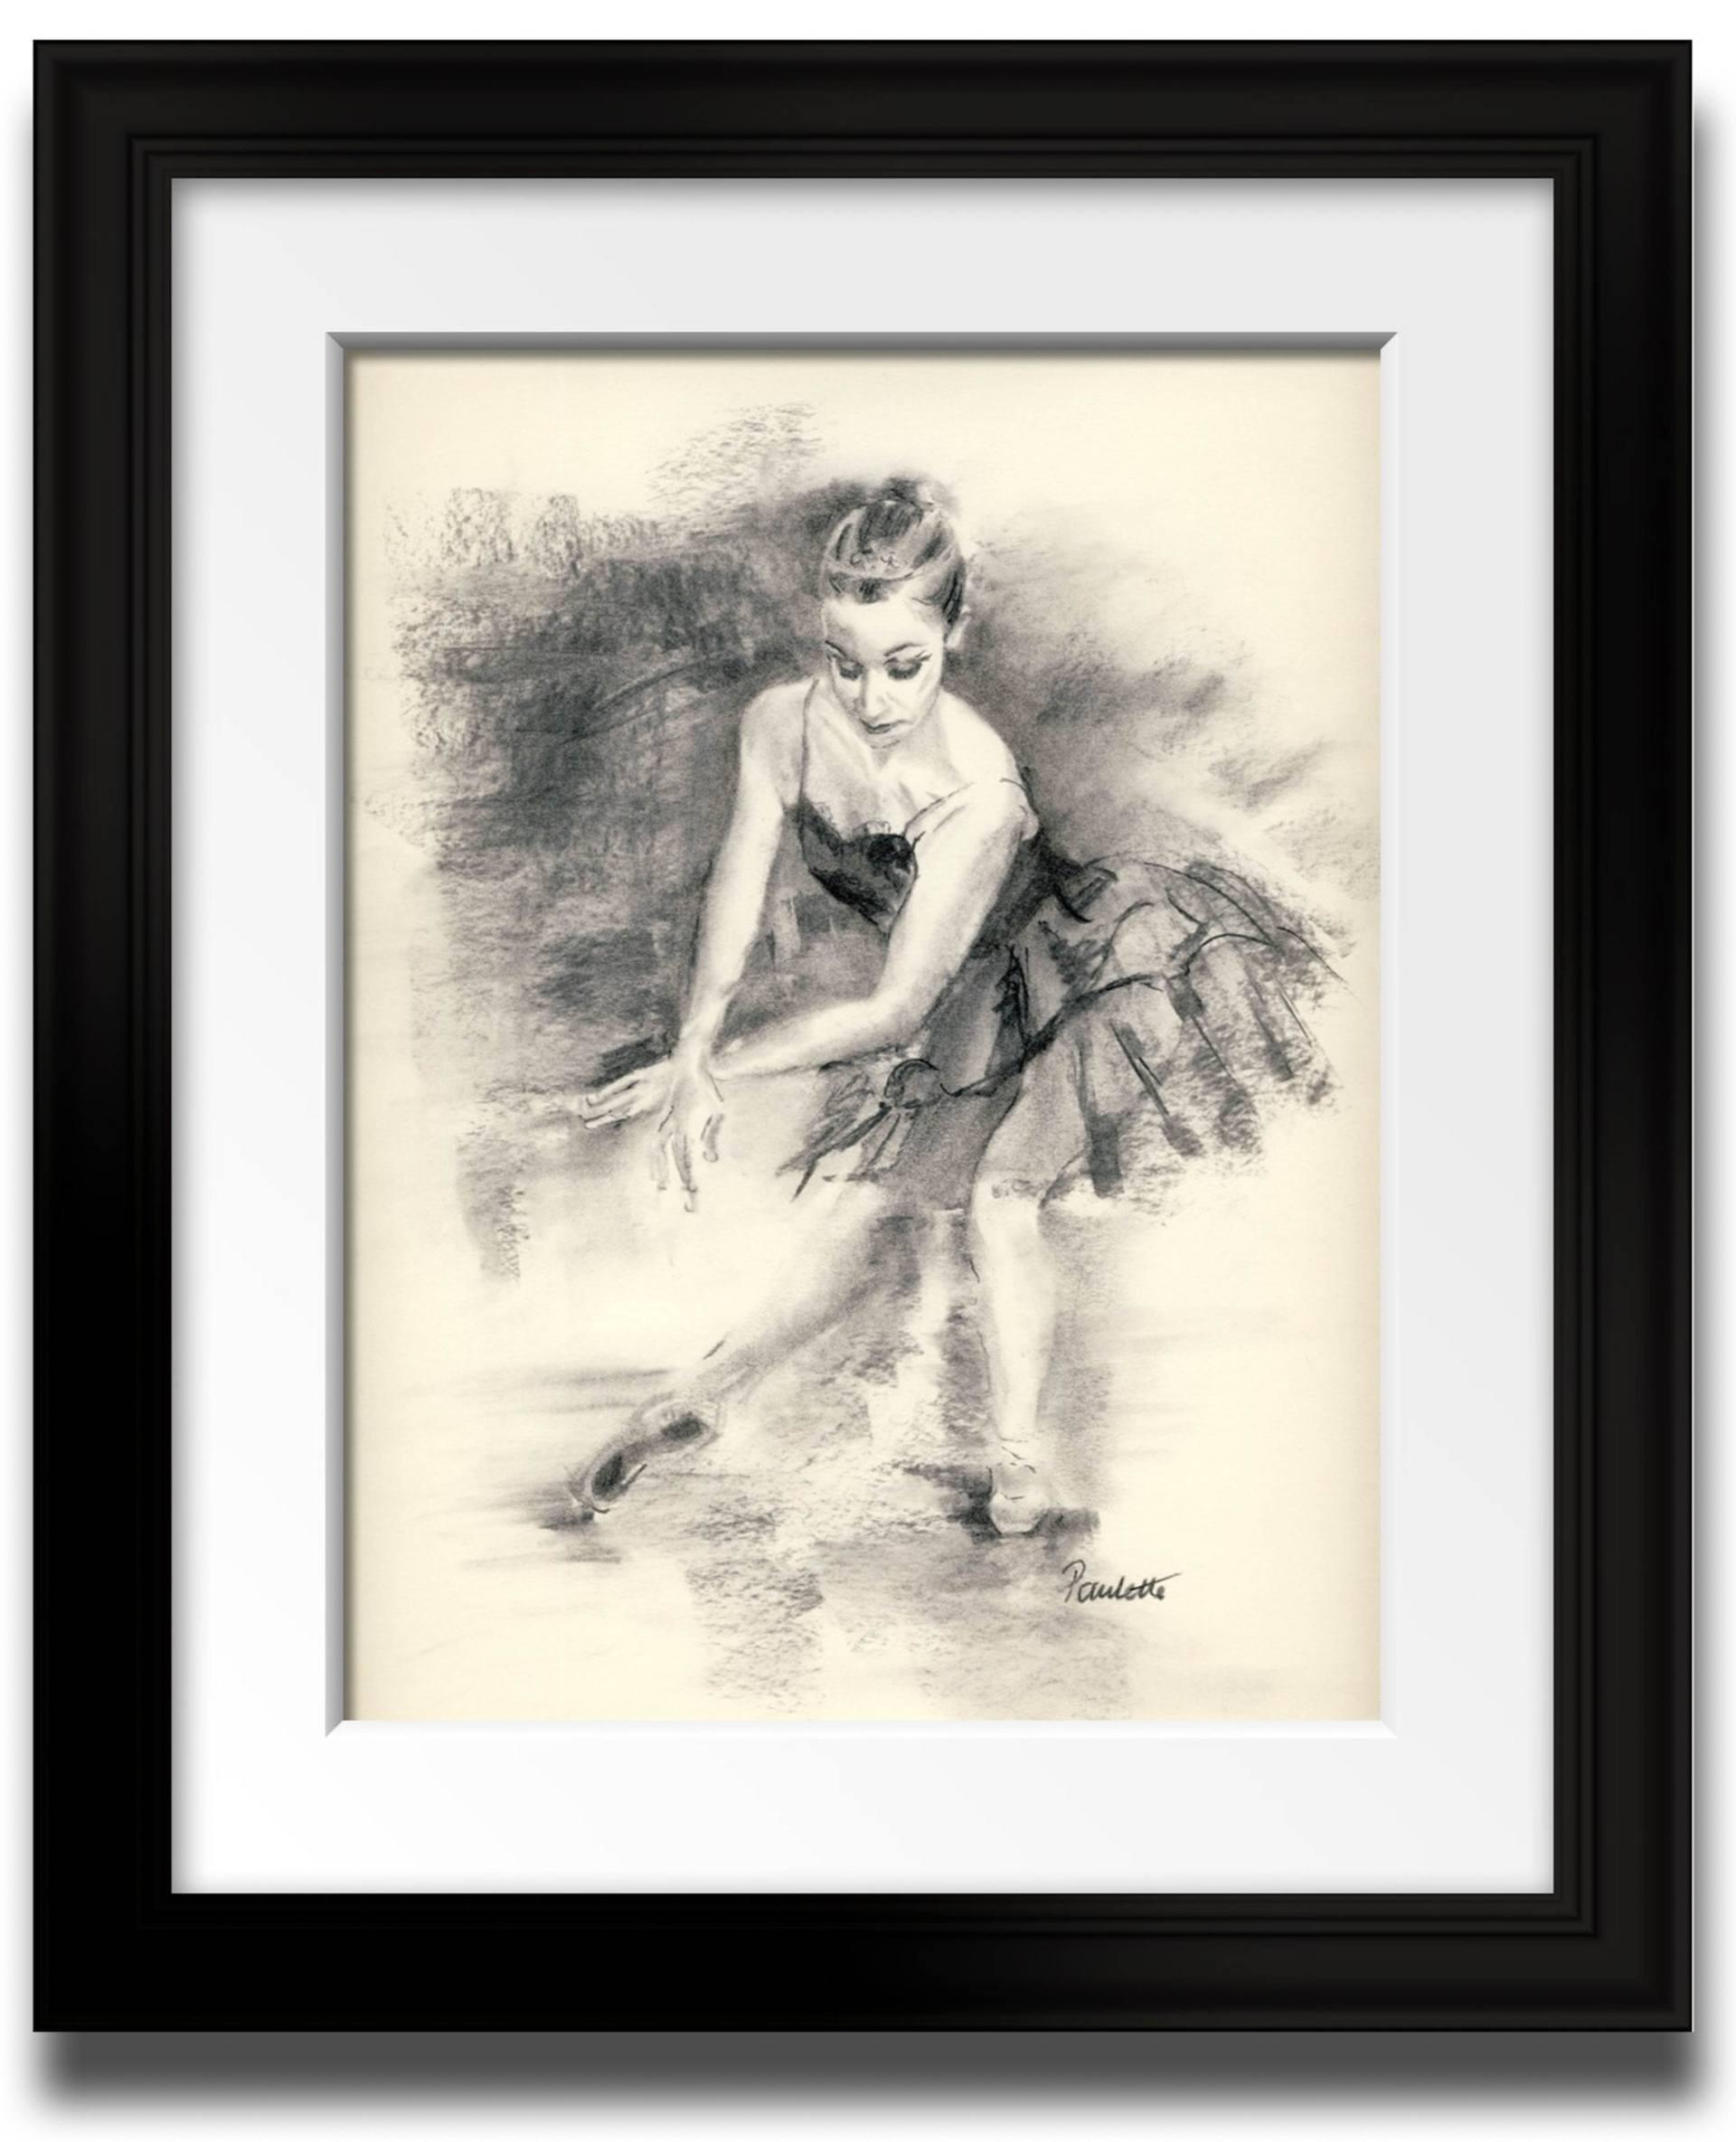 1920x2369 Saatchi Art Ballerina Pose Drawing By Paulette Farrell